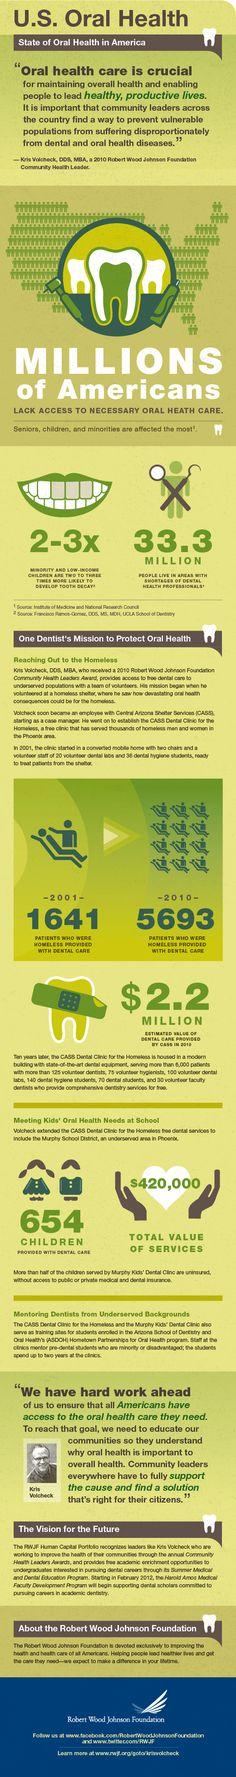 Vermilion created this wonderful infographic created on behalf of Robert Wood Johnson Foundation.